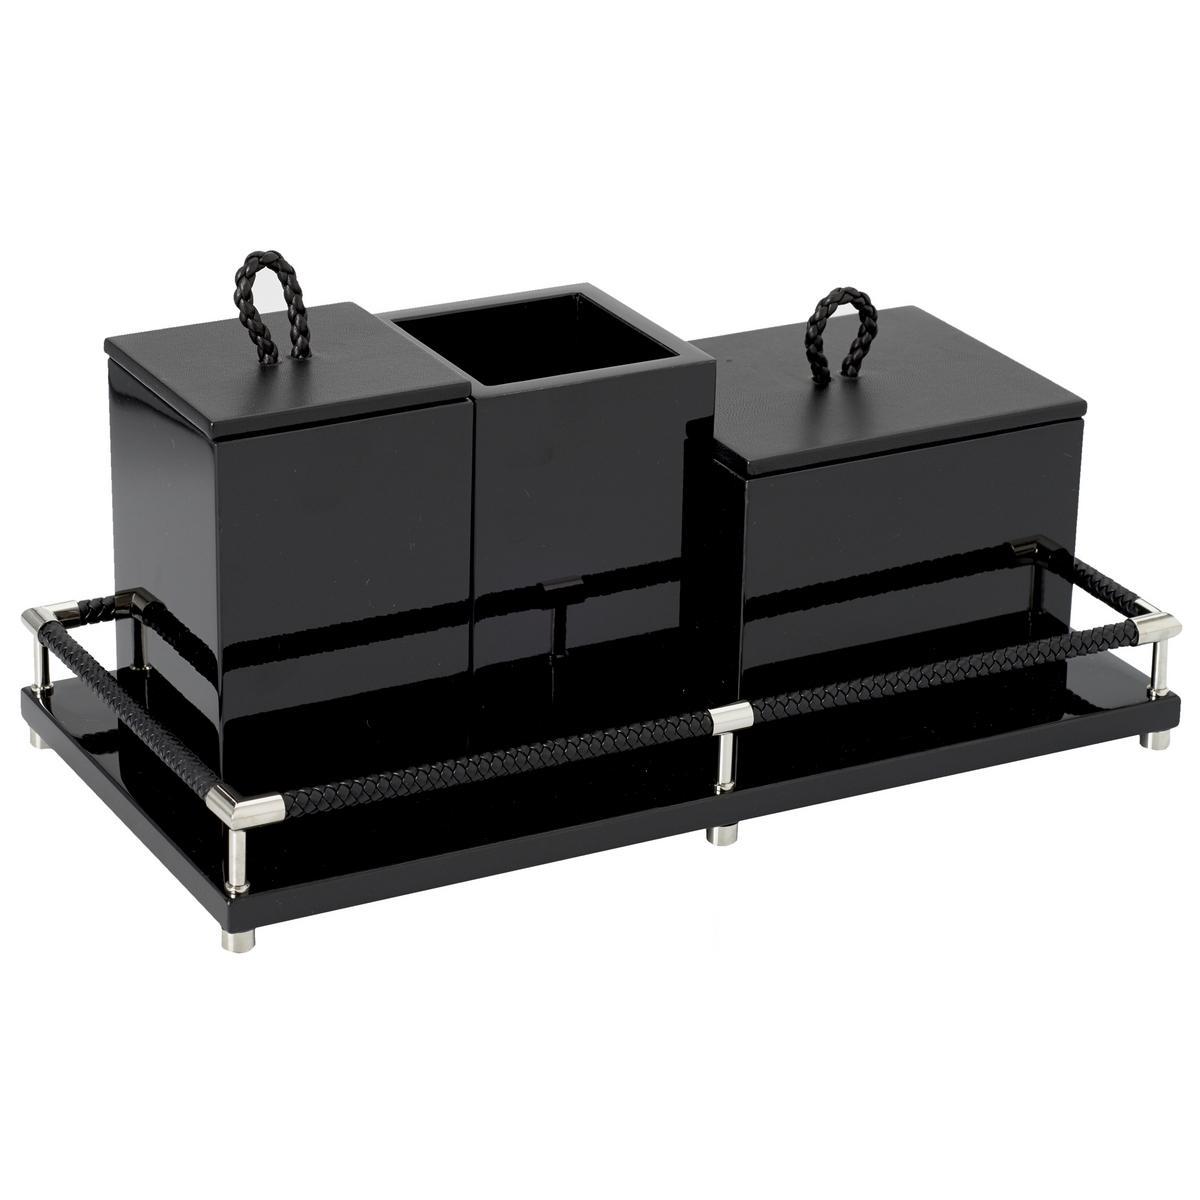 riviere vanity 4 pieces bathroom set black. Black Bedroom Furniture Sets. Home Design Ideas